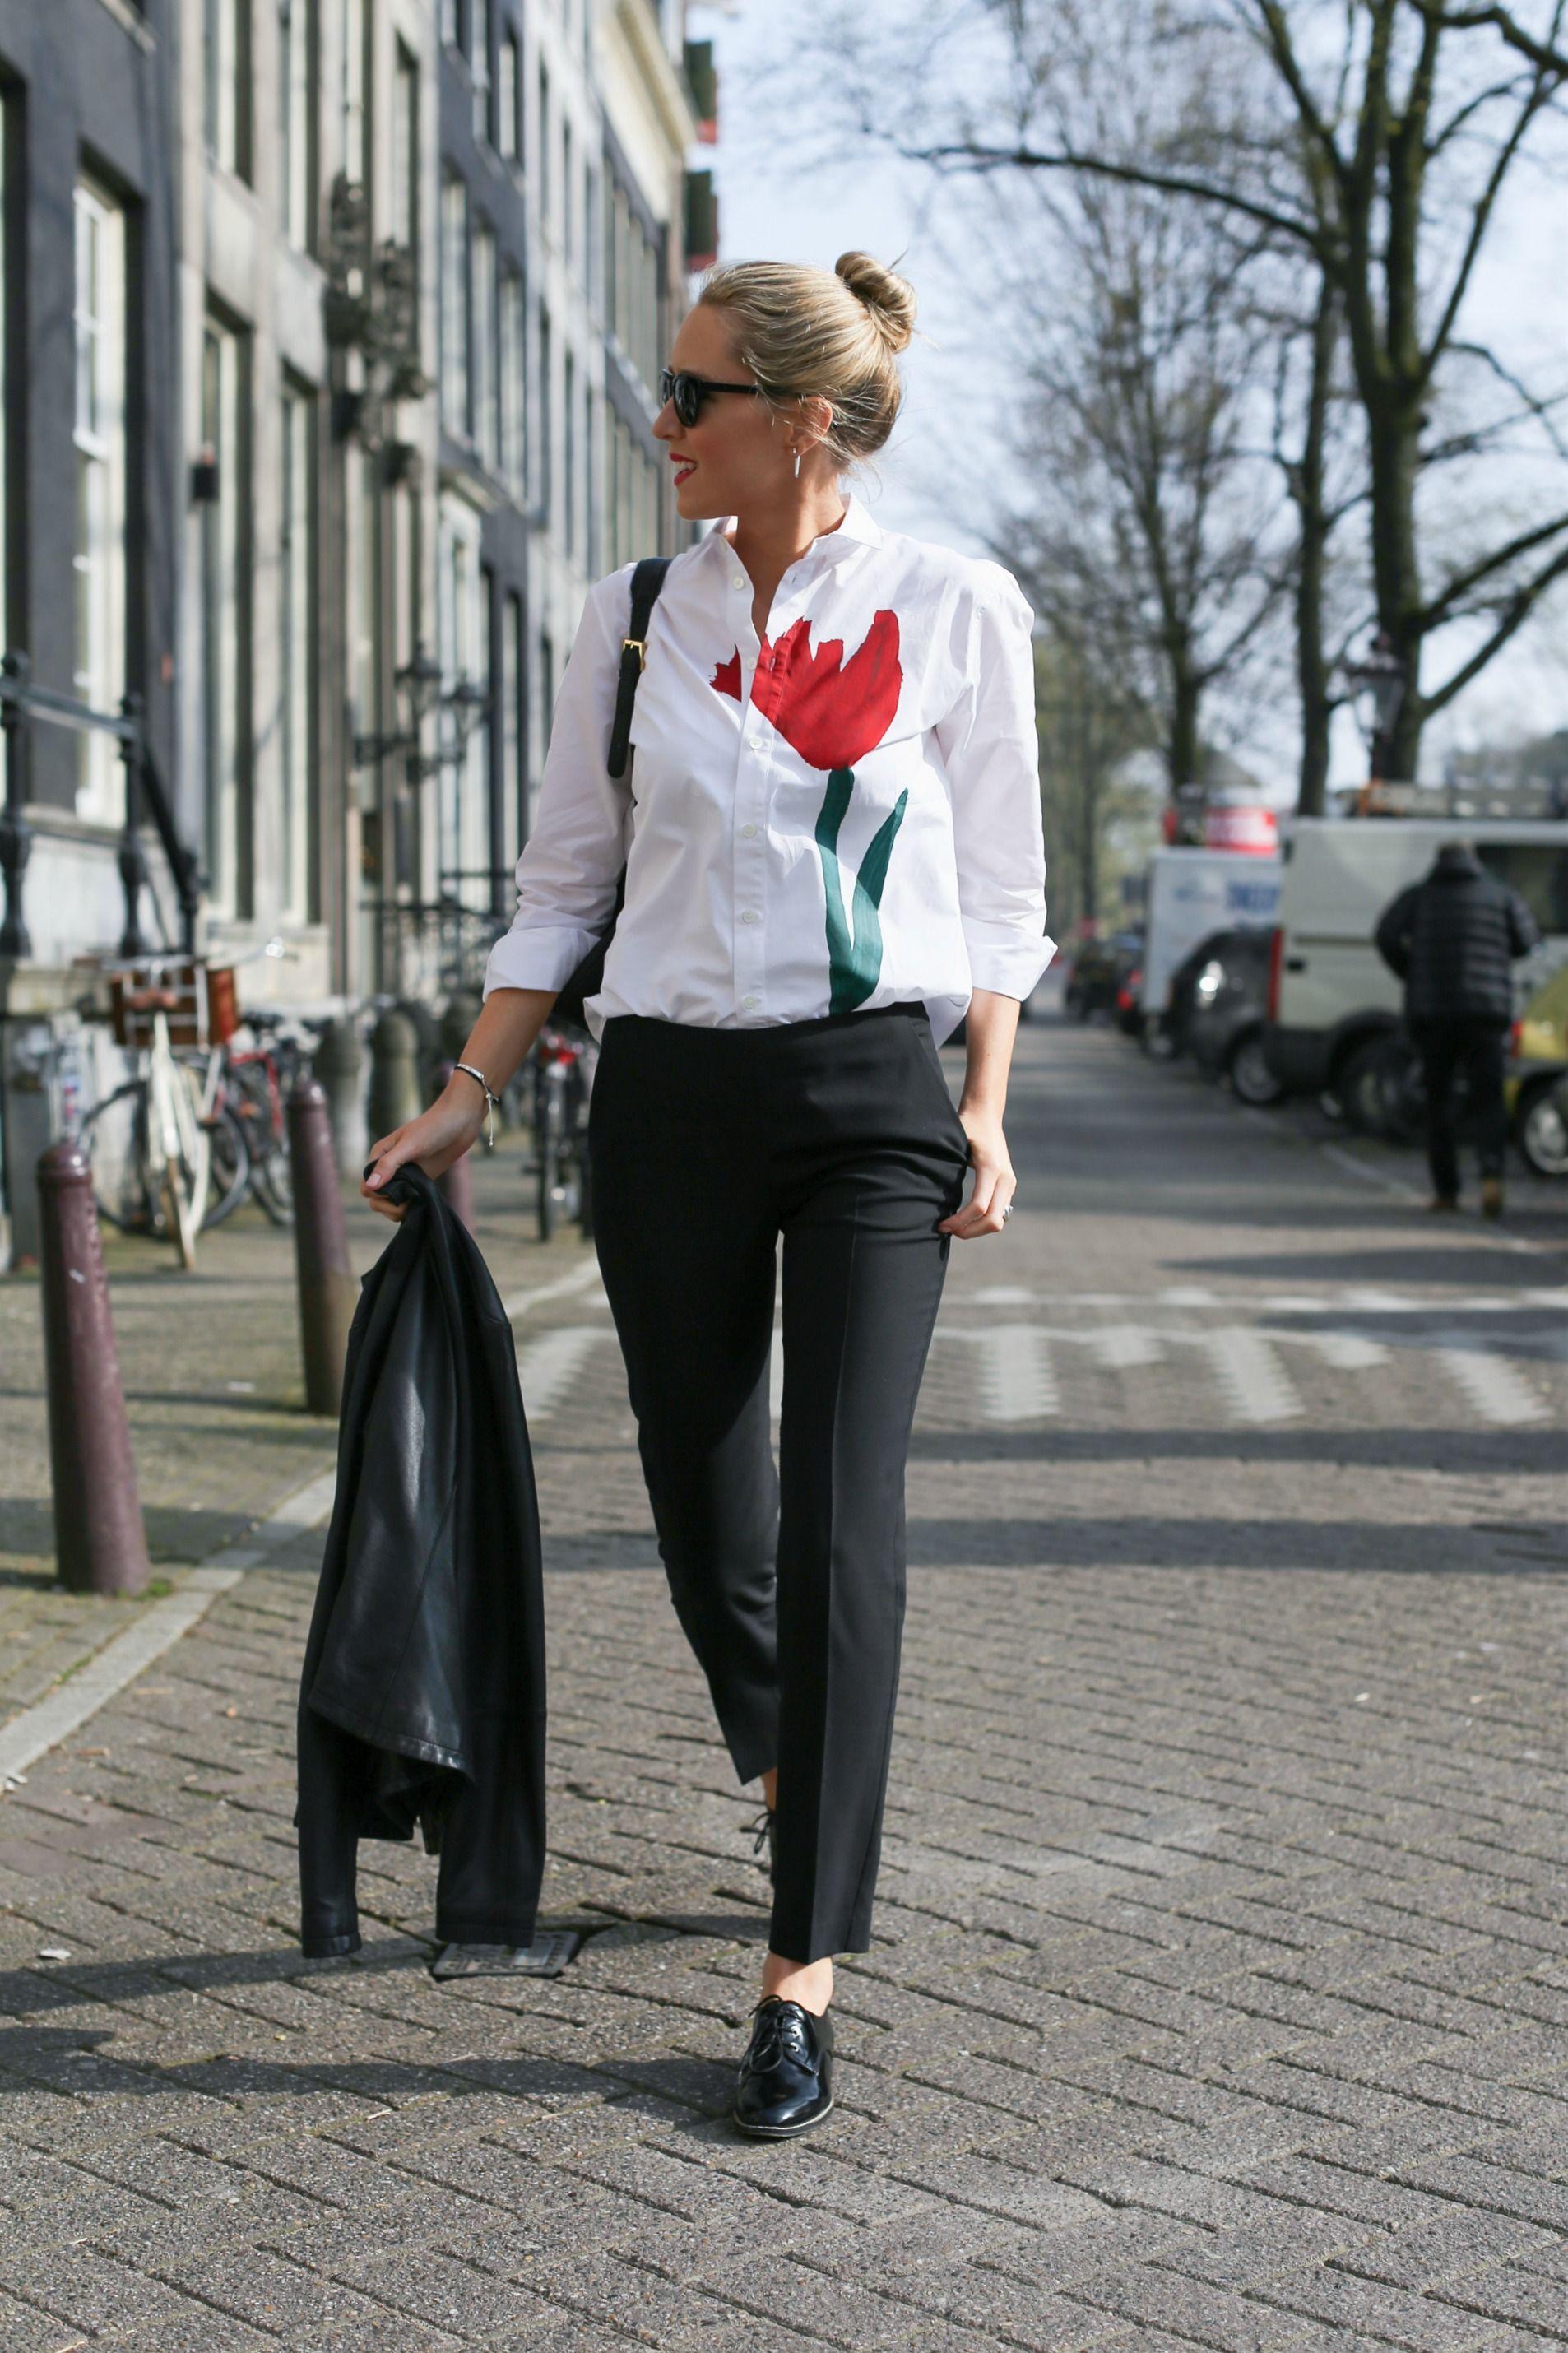 Amsterdam Travel Memo Dutch Tulipmemorandum Formerly The Classy